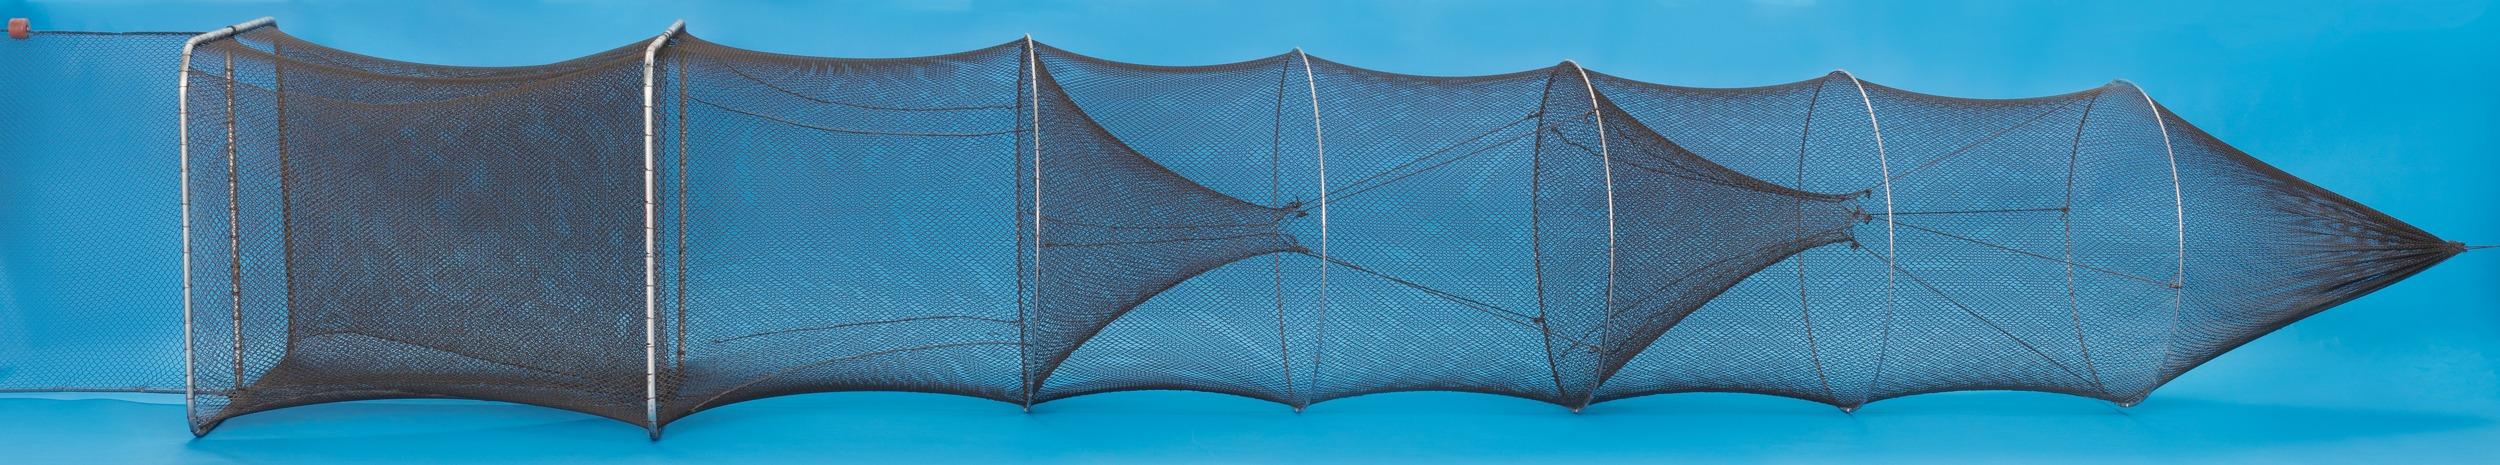 3'x4' Fyke Net with Standard Throats